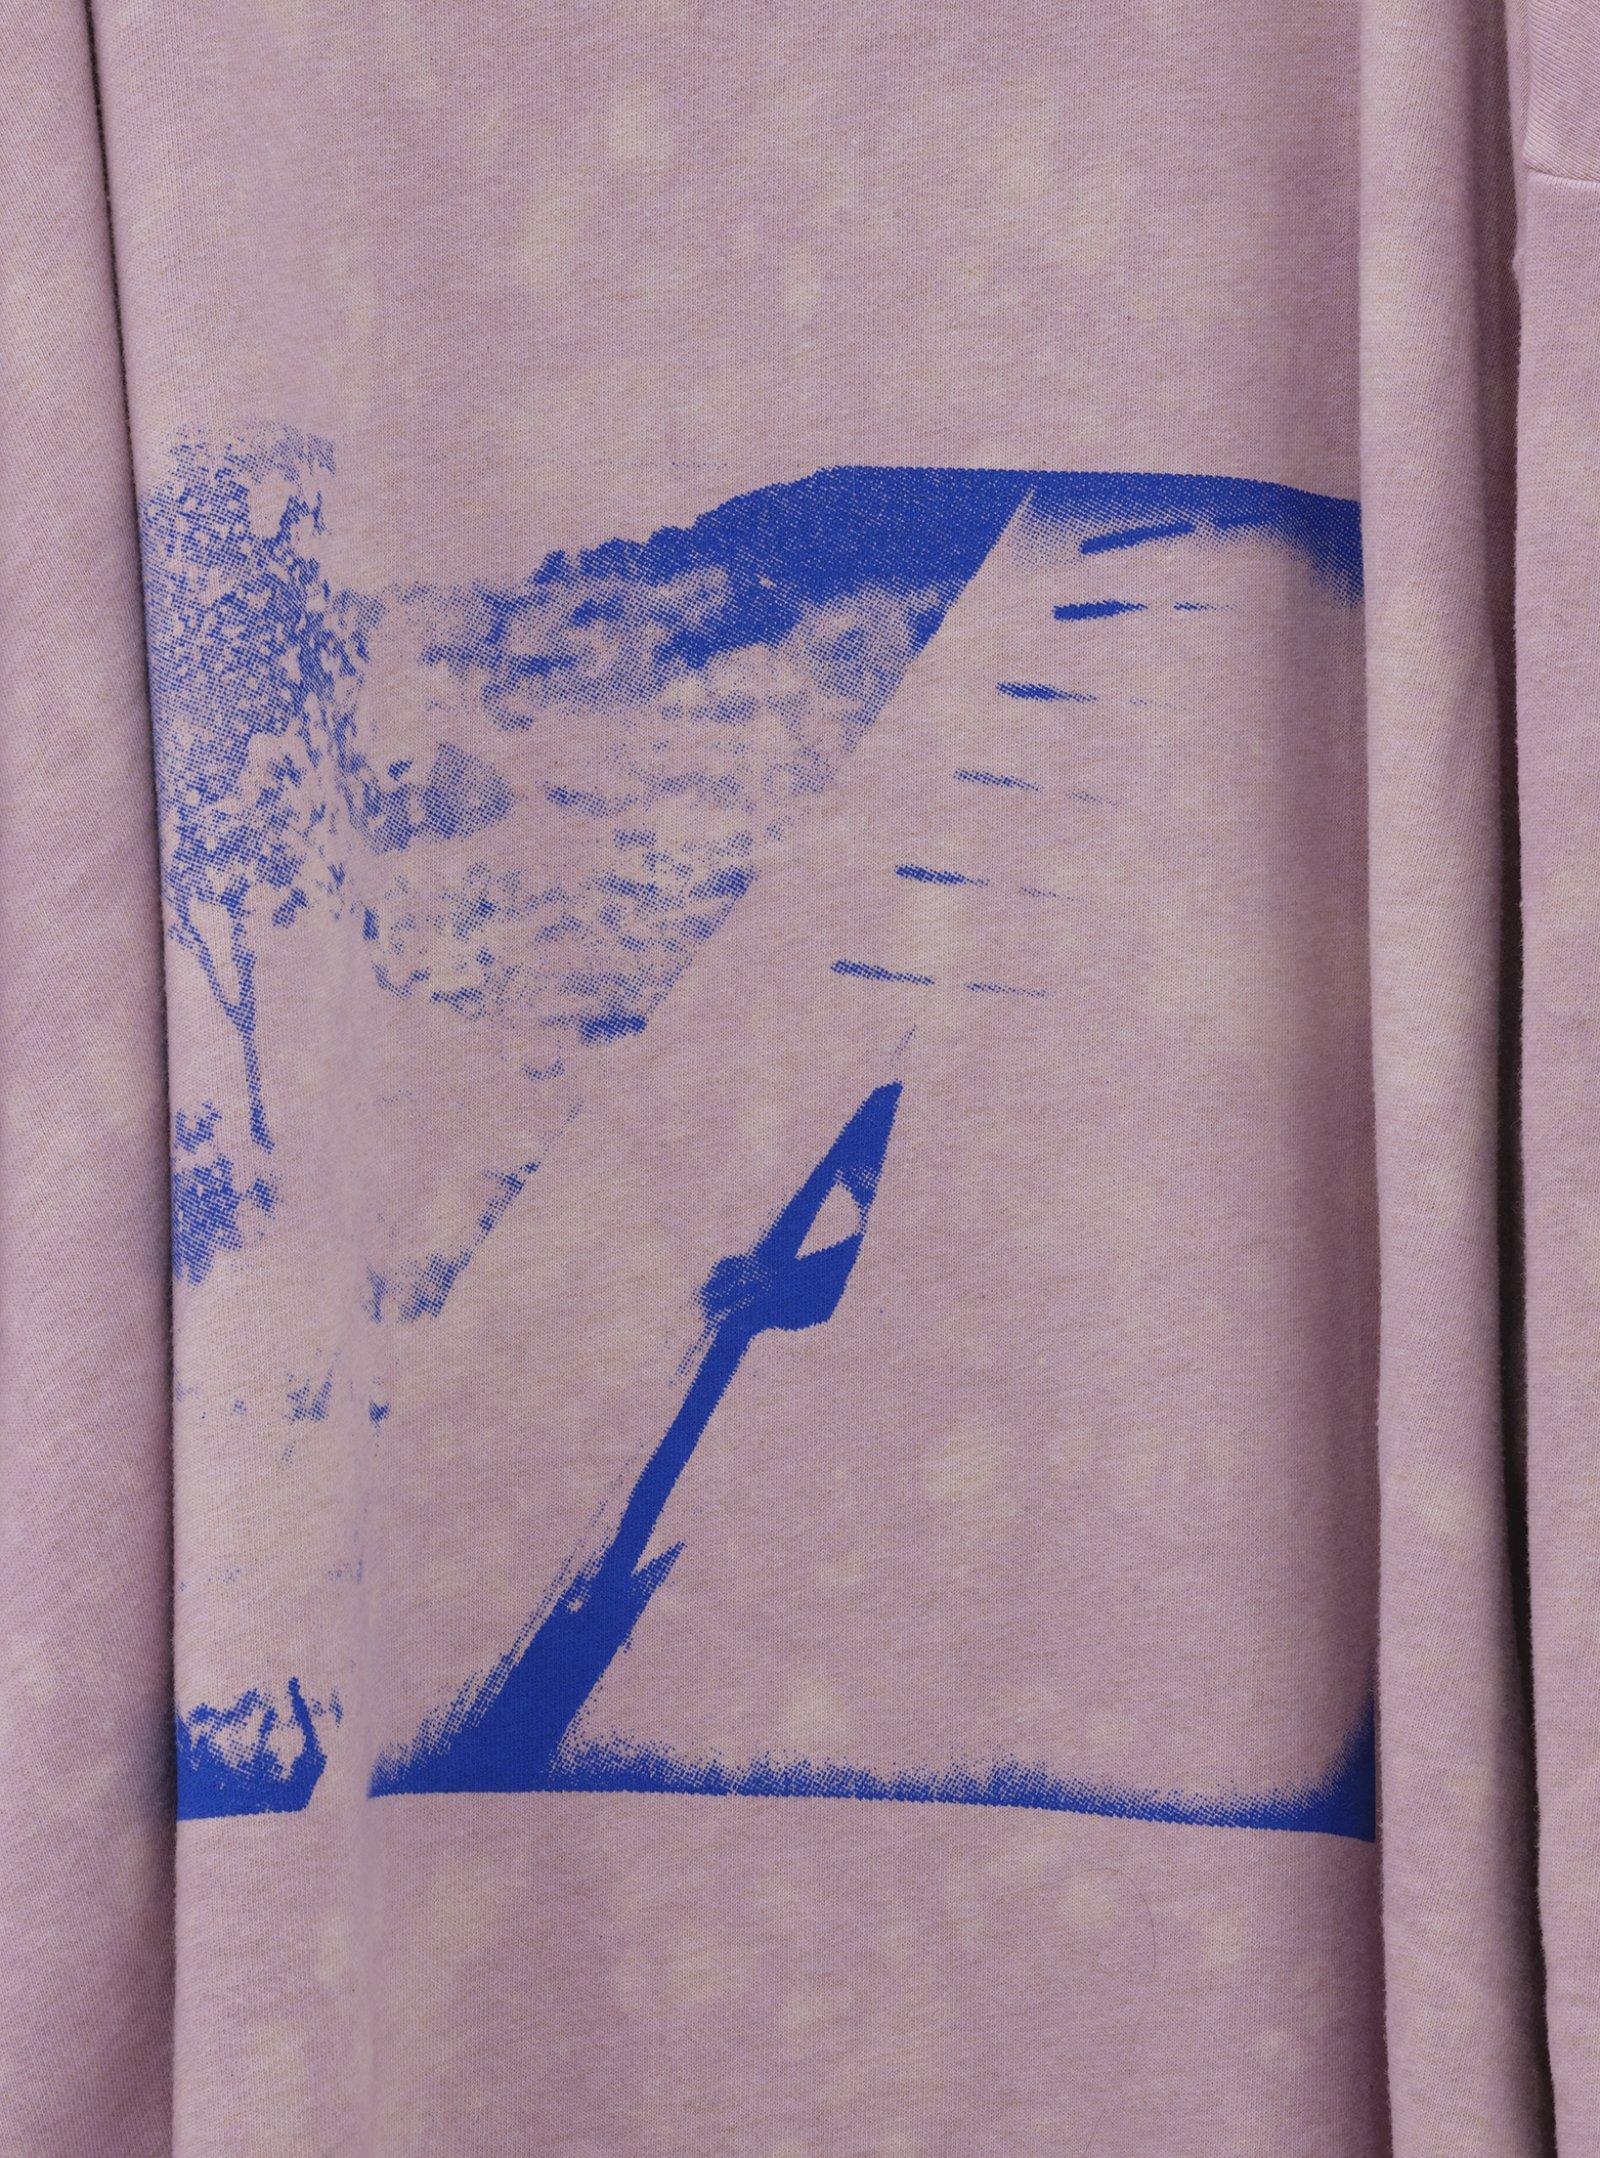 Duane Linklater, whiteeagle (detail), 2020, handmade sweater, cochineal dye, silkscreen, nails, 38 x 20 x 5 in. (97 x 51 x 13 cm)